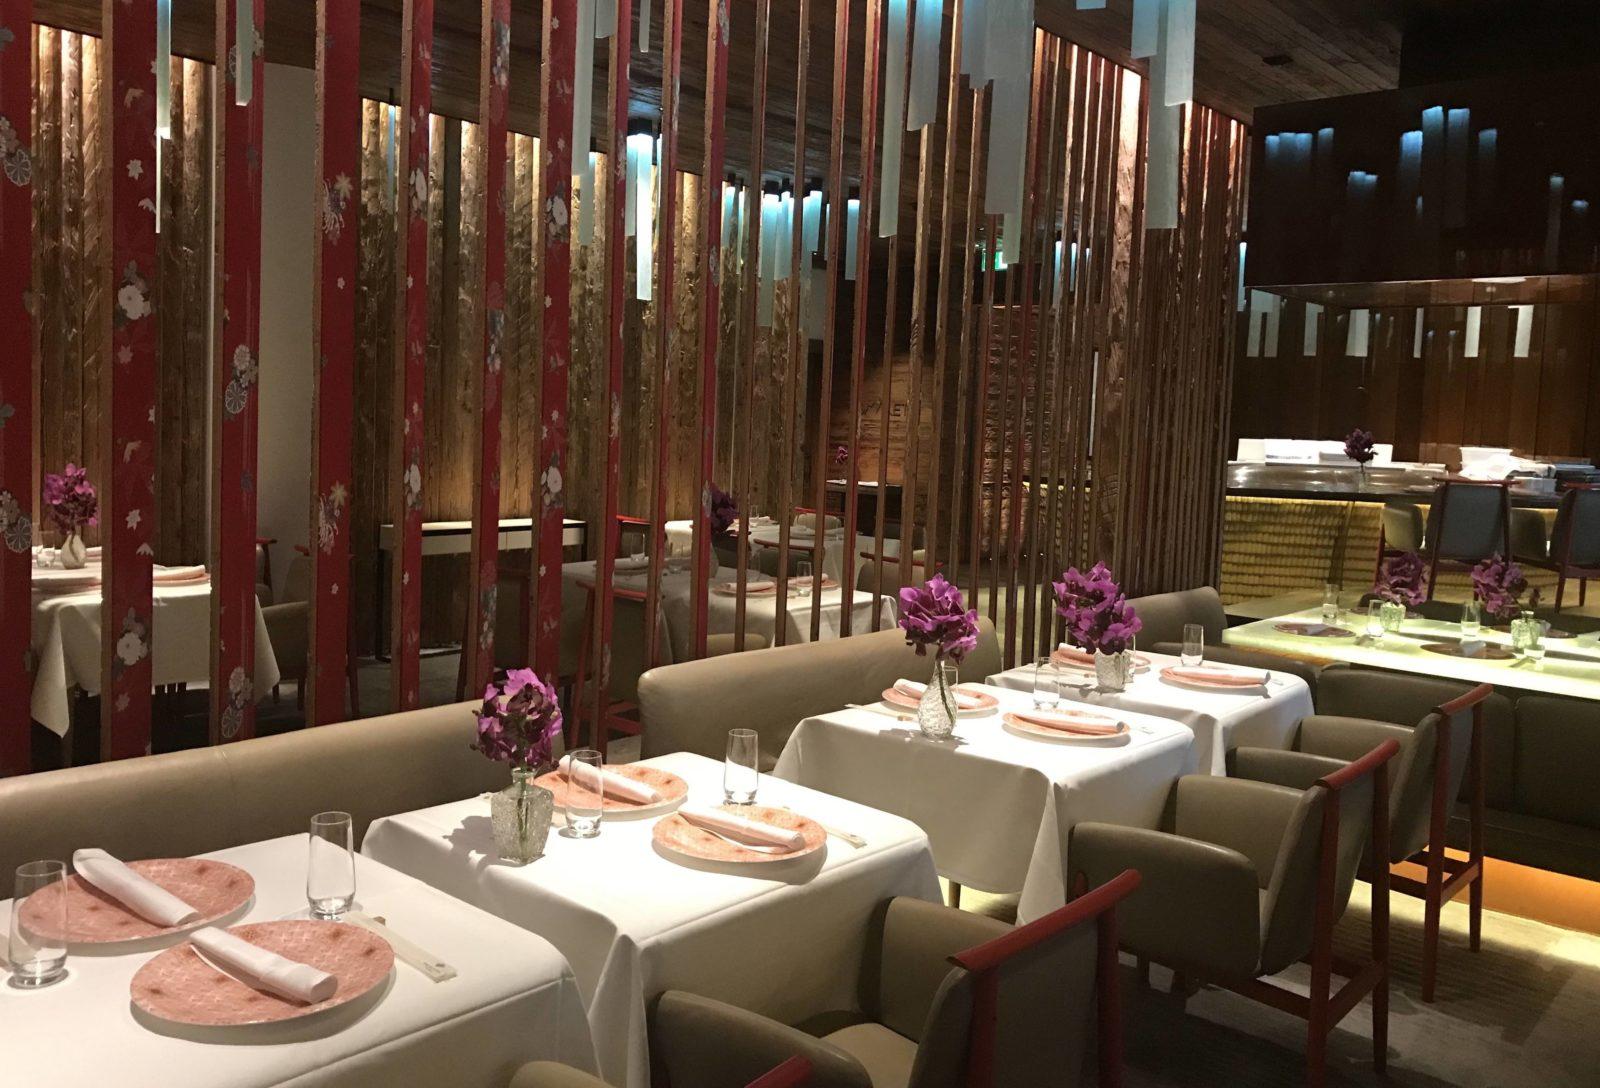 MEGU restaurant japonais Hôtel Alpina gstaad